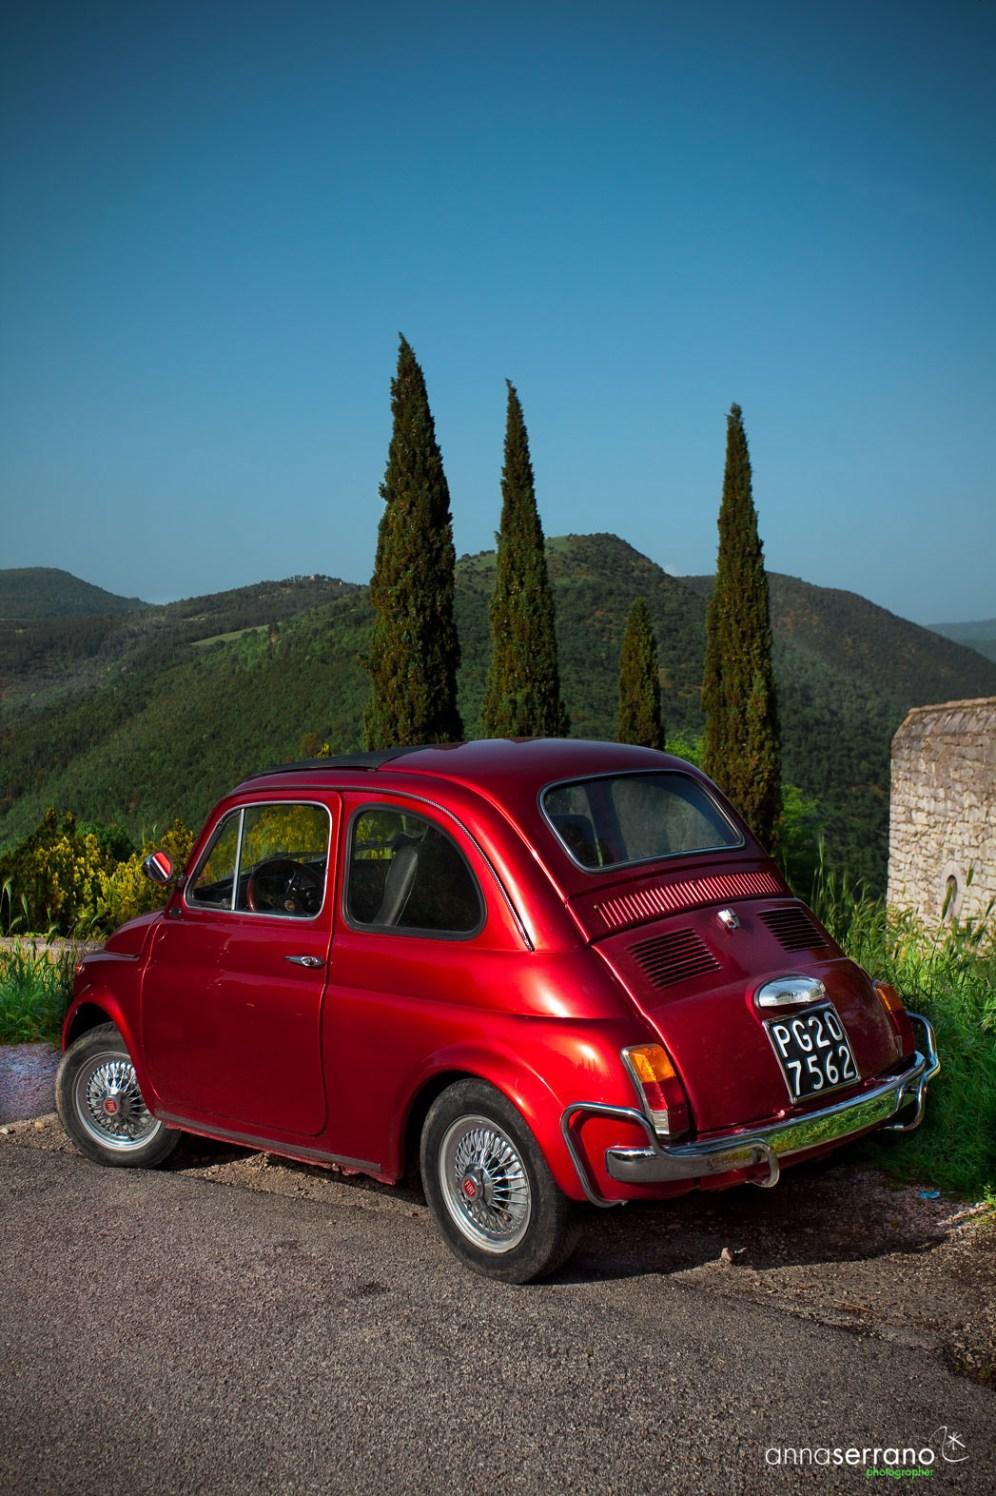 017-I-Assisi-0014